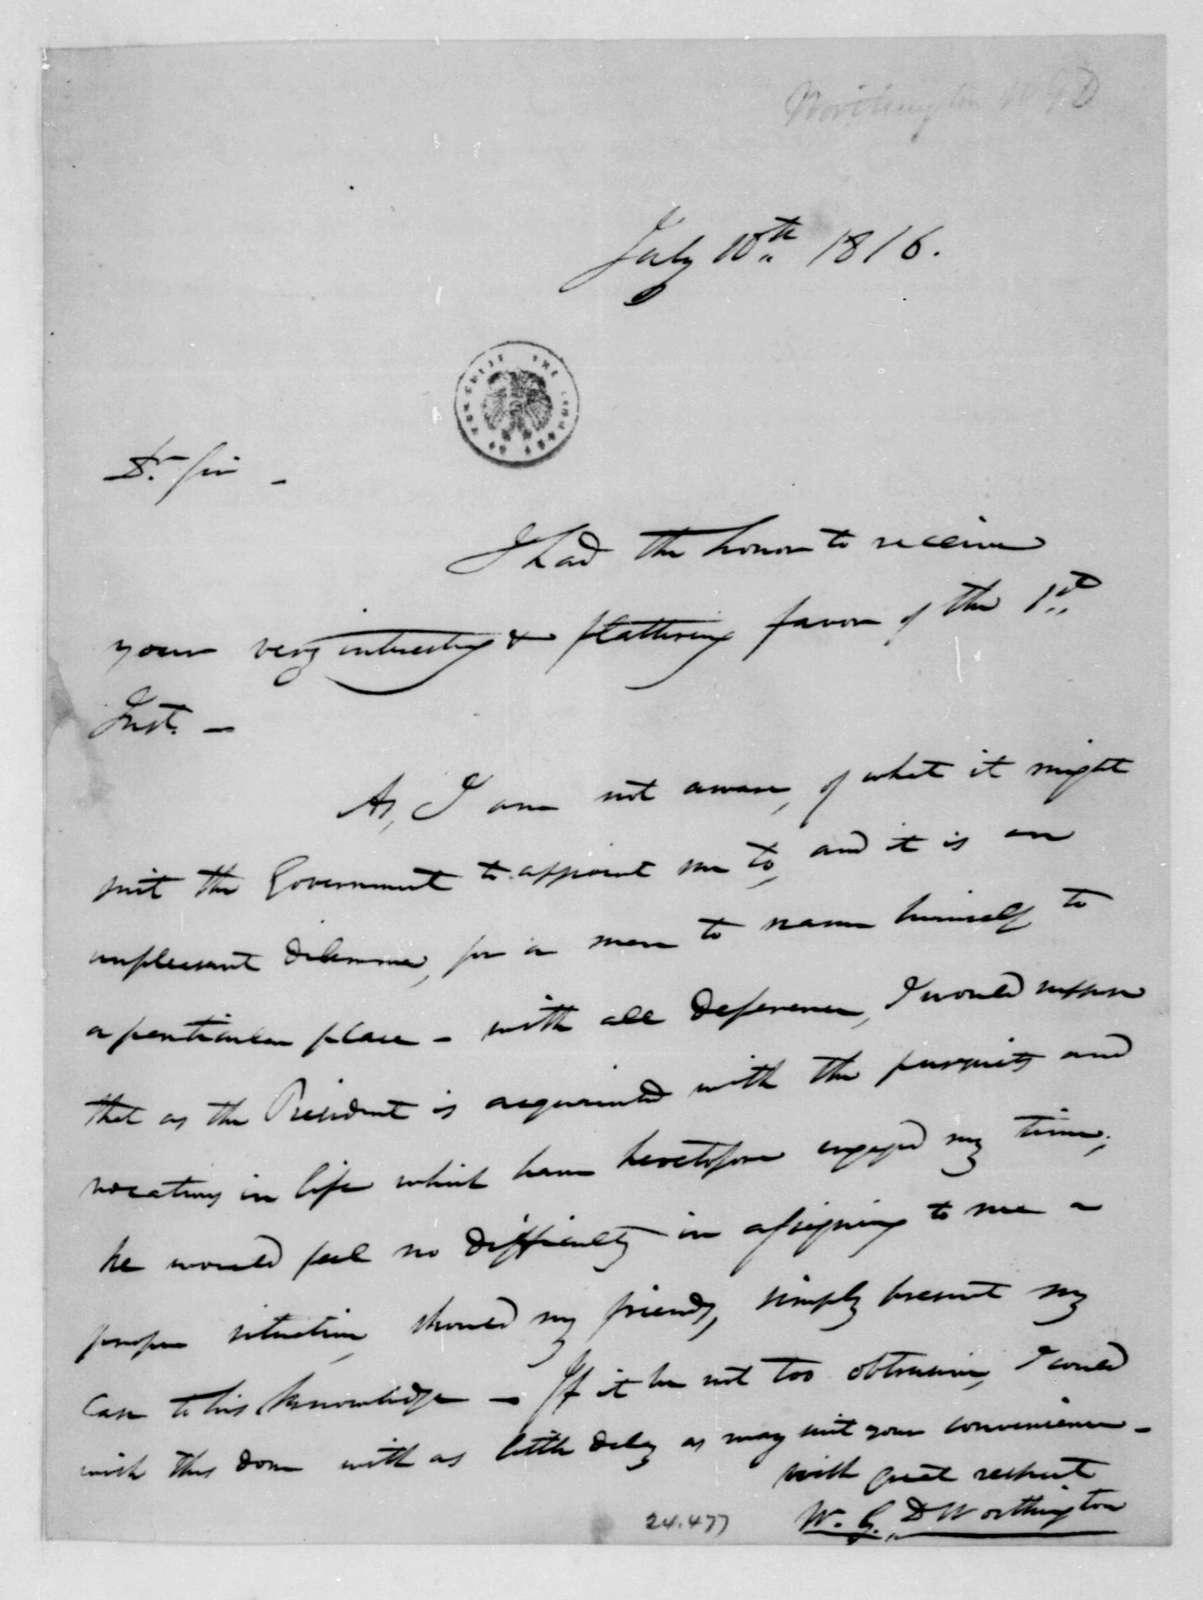 W. G. Worthington to Unknown, July 10, 1816.